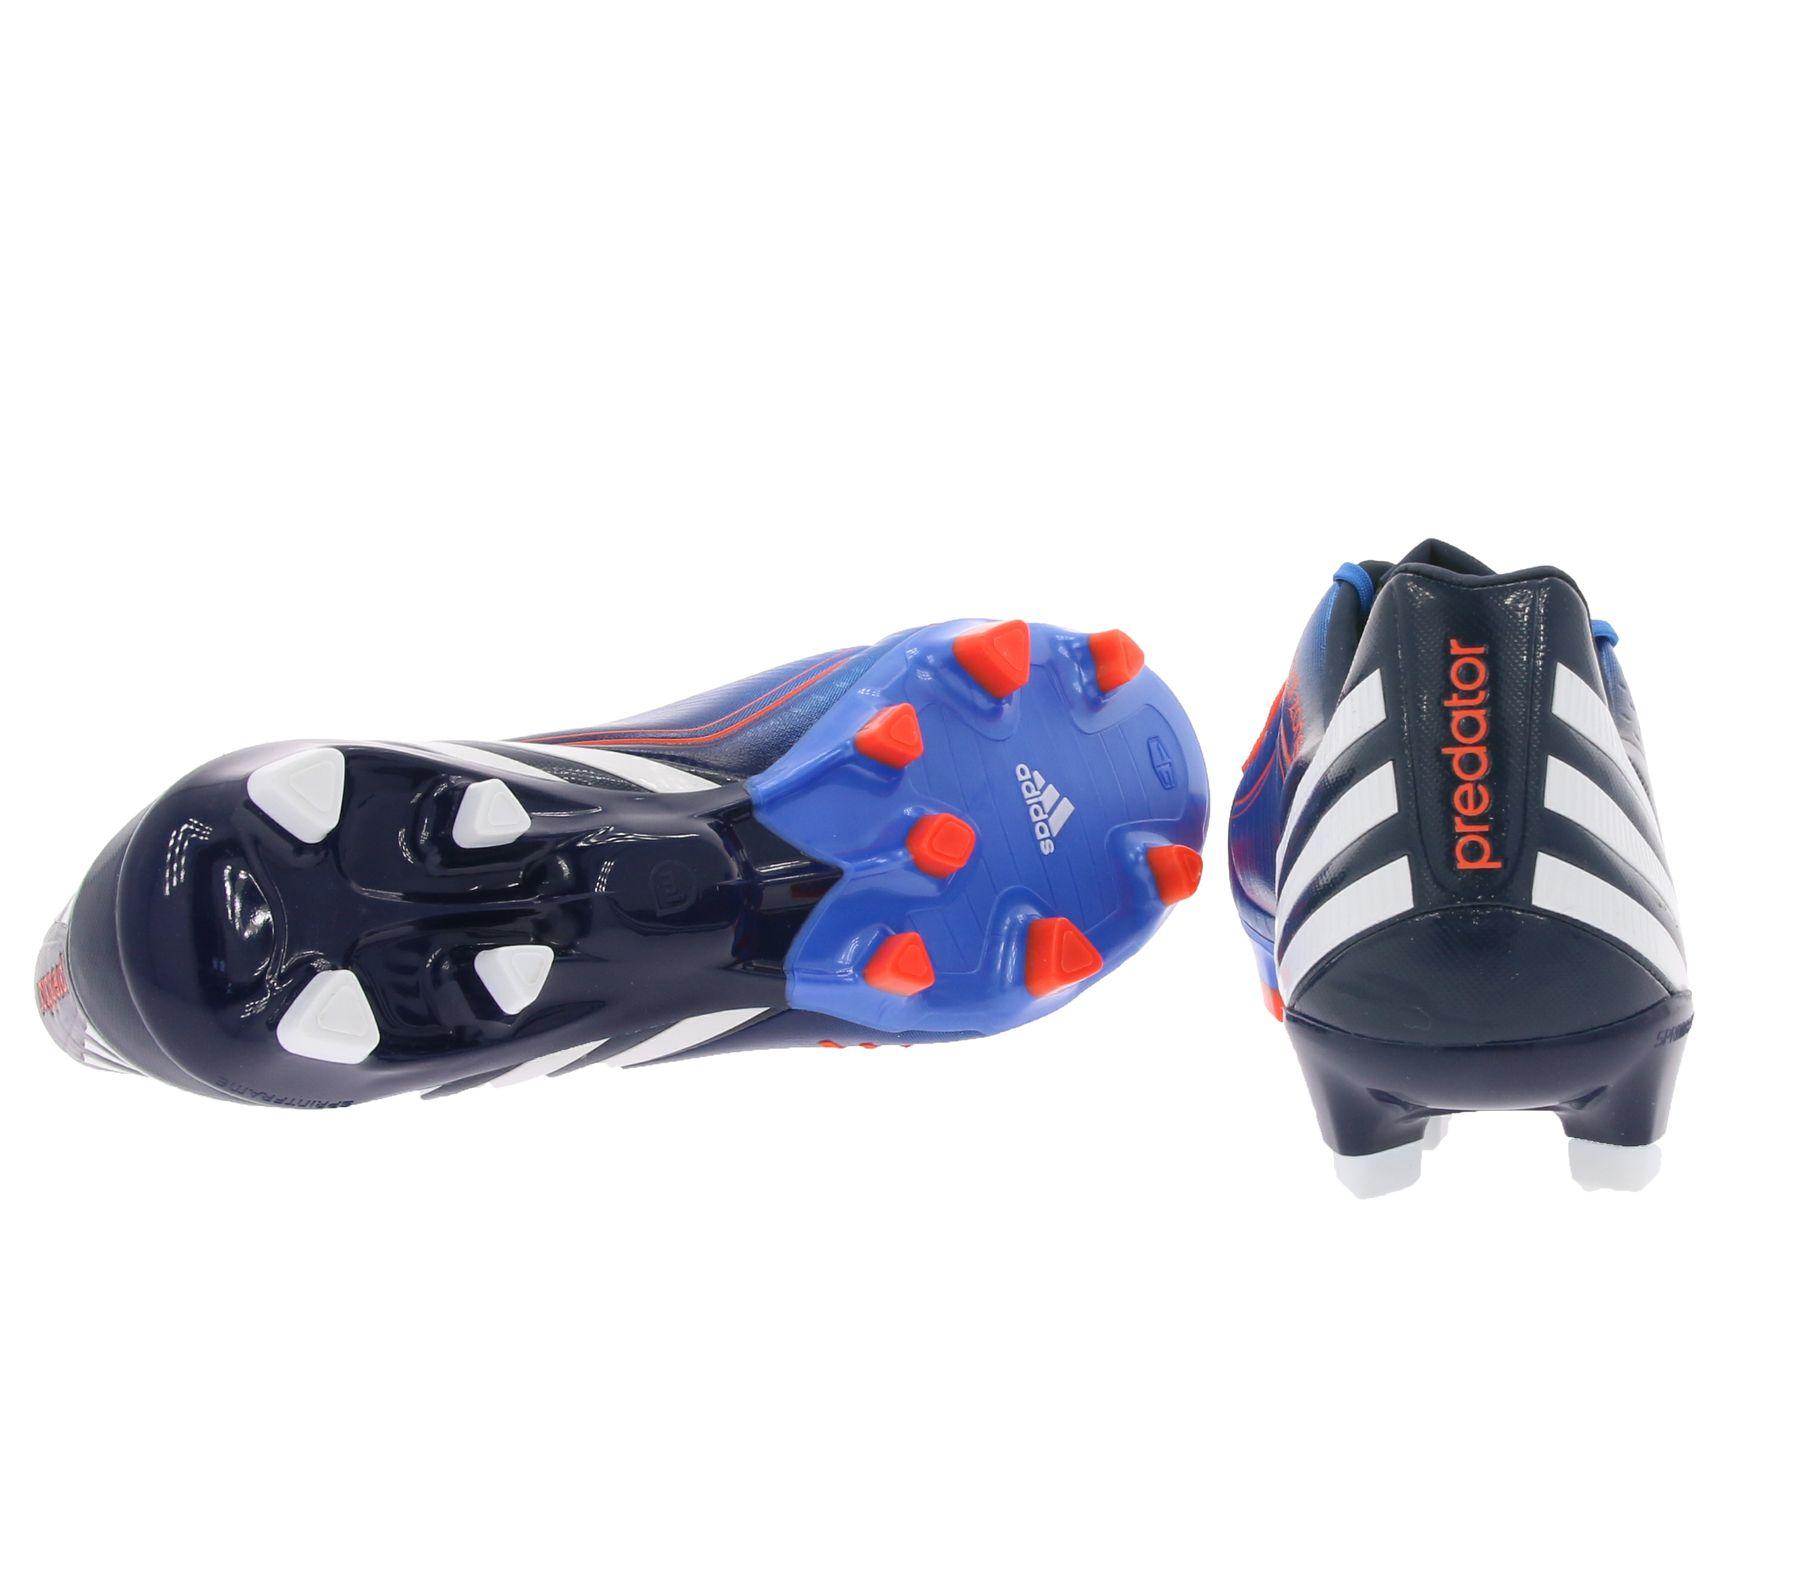 quality design 7c01c b7e5f Fußballschuhe Online Shop   Outlet 46